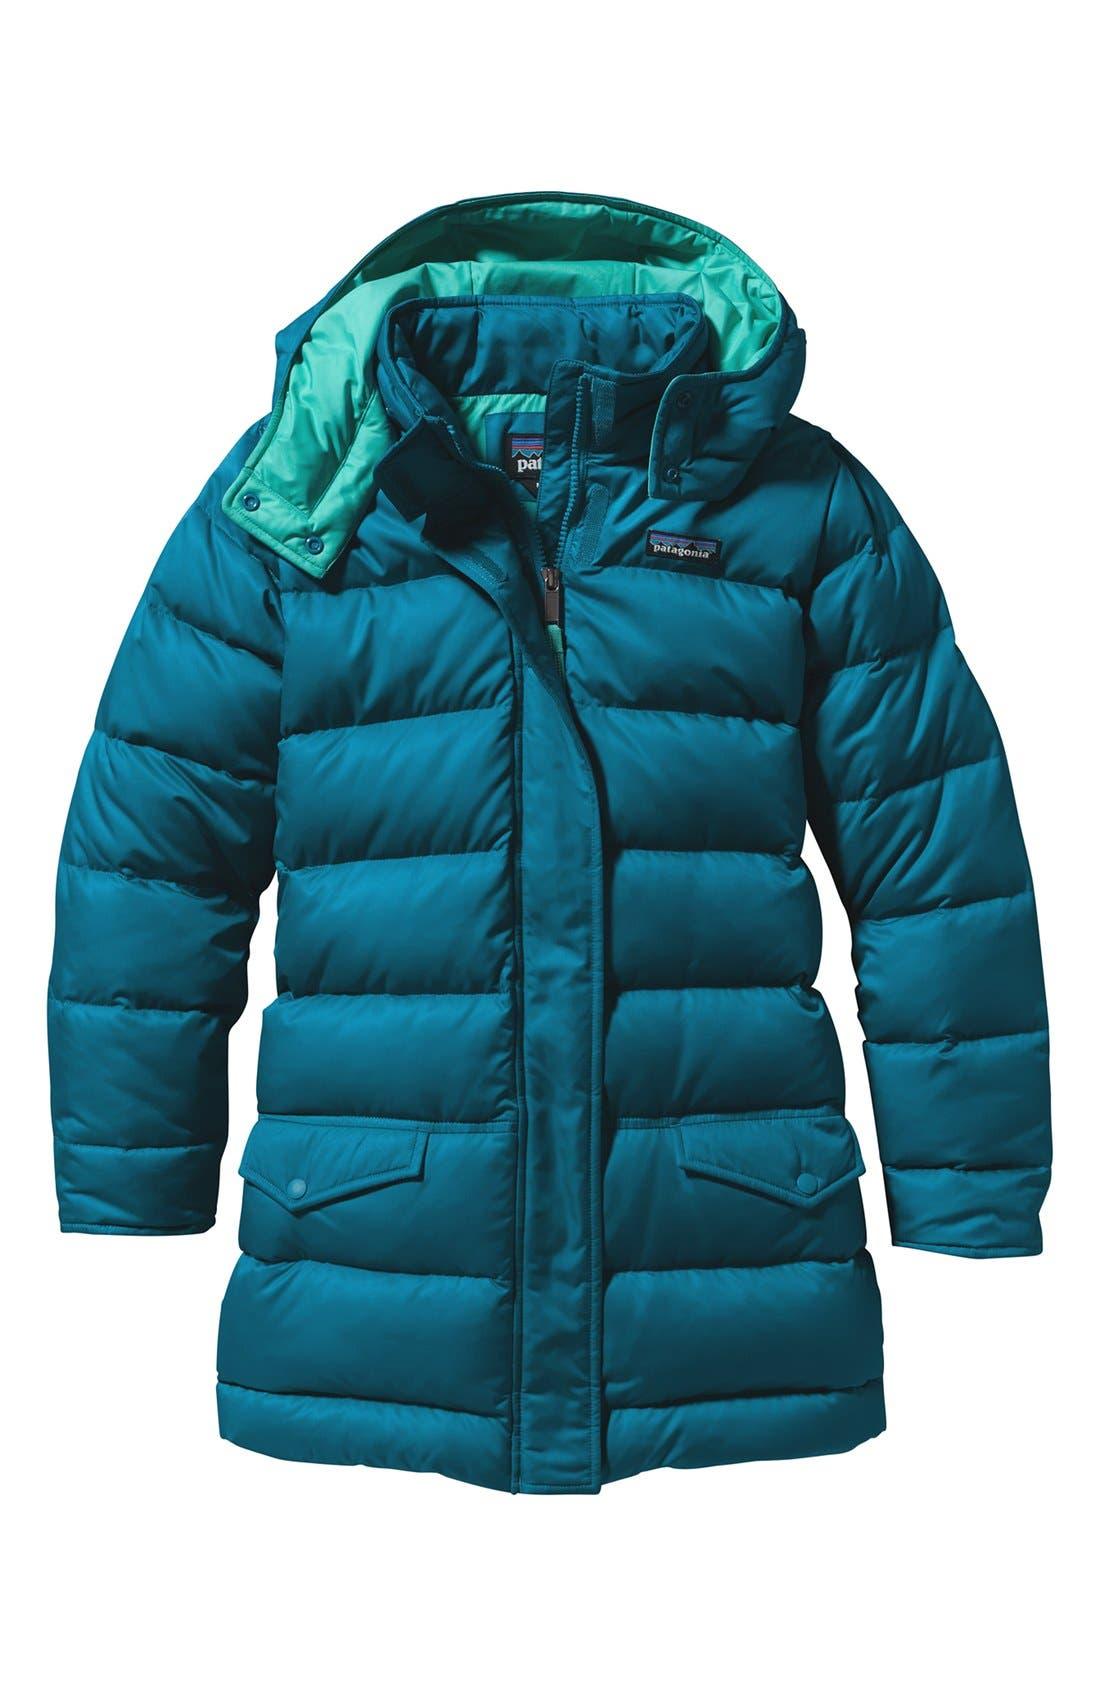 Alternate Image 1 Selected - Patagonia 'Down For Fun' Water Repellent Coat (Little Girls & Big Girls)